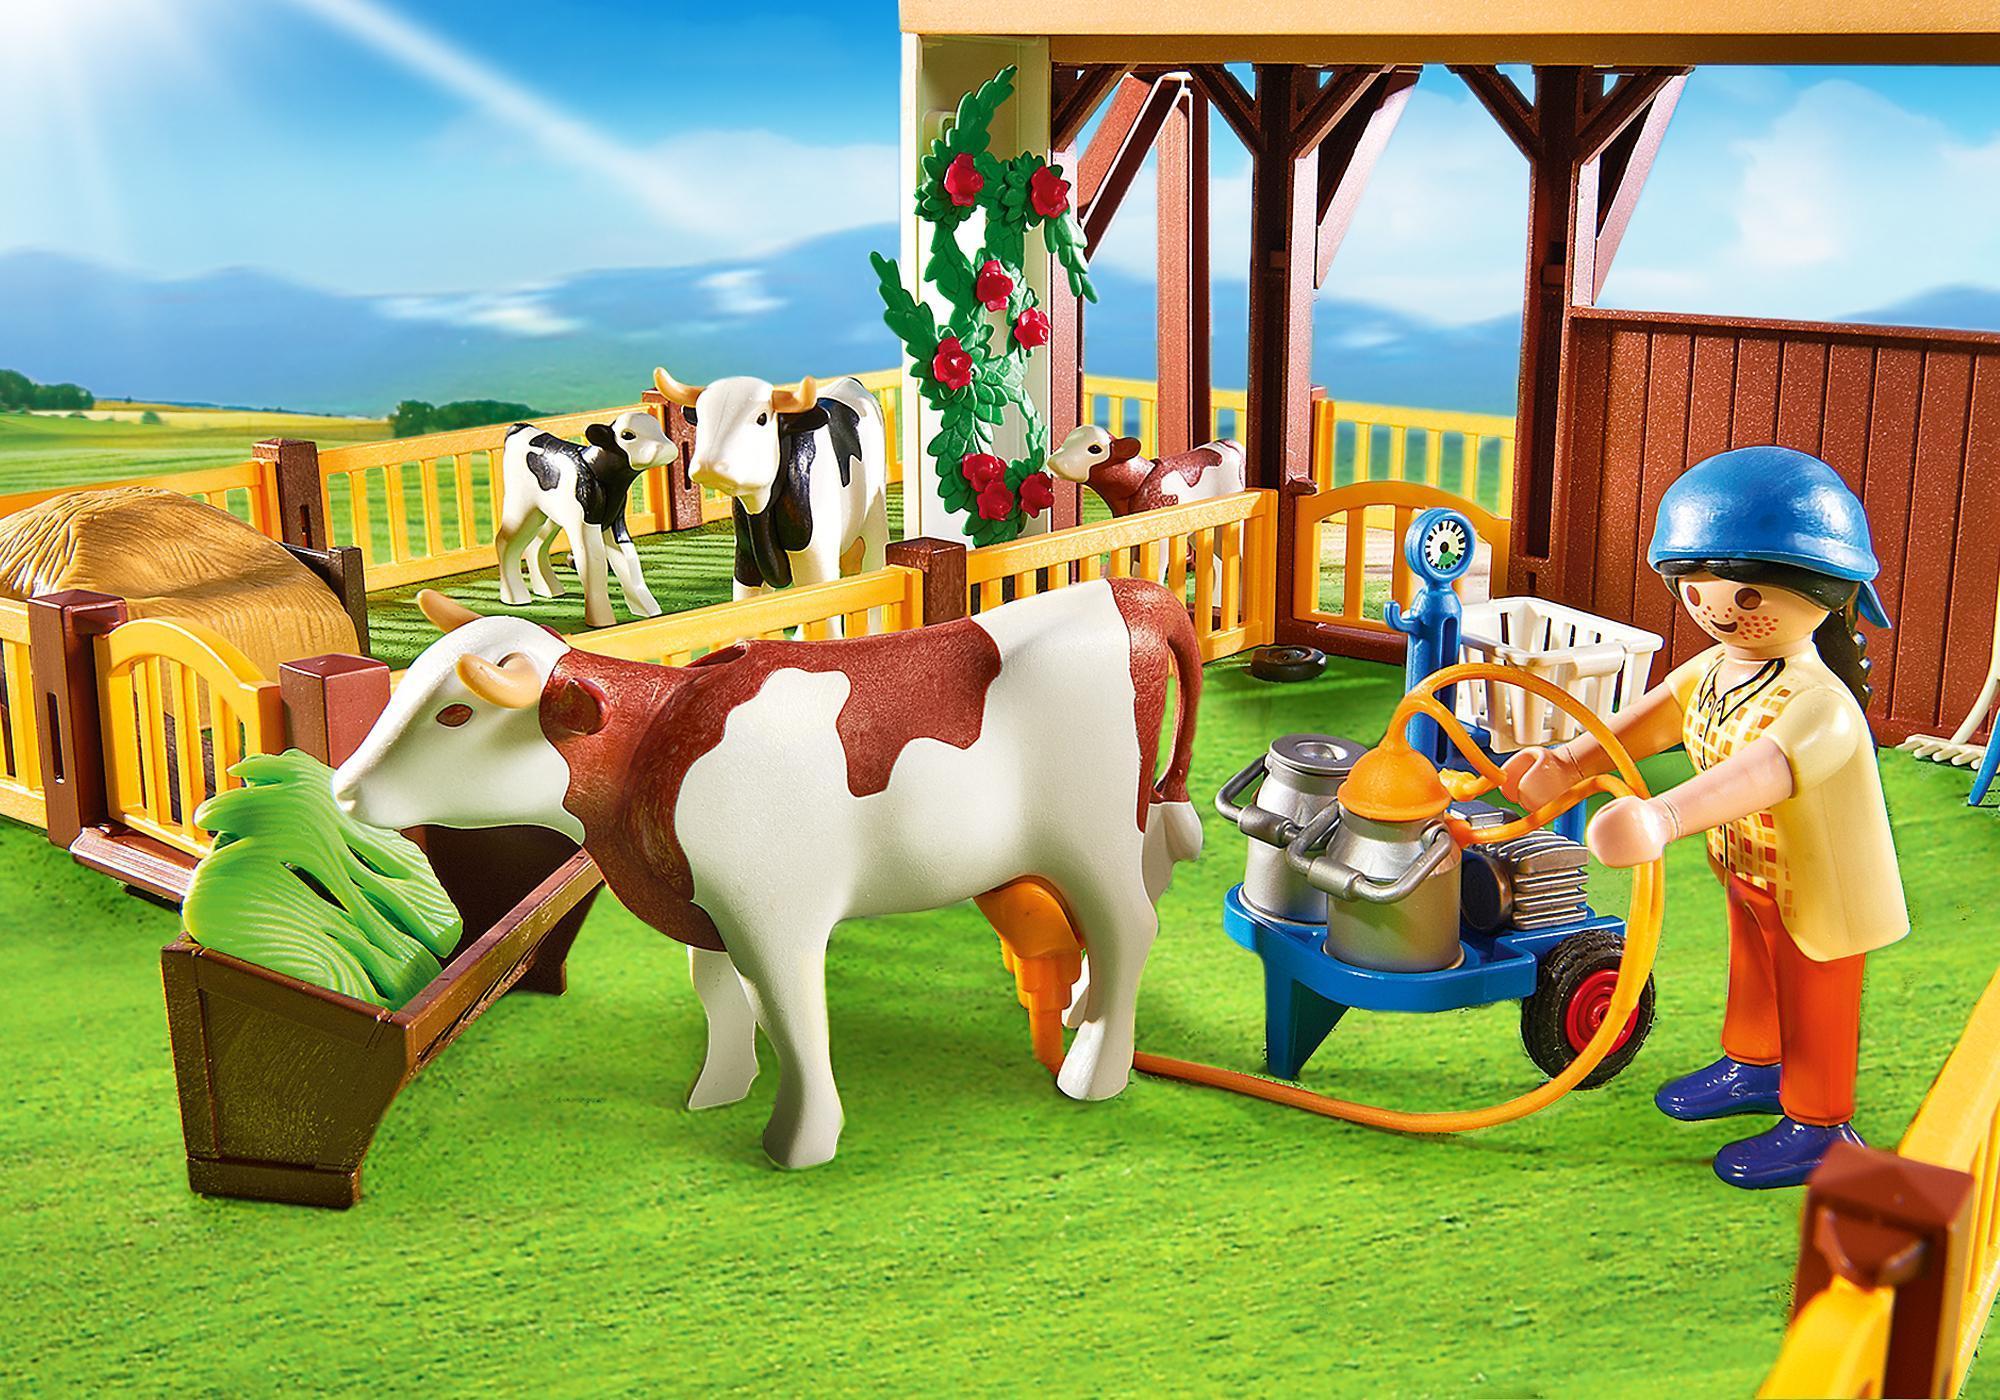 http://media.playmobil.com/i/playmobil/6120_product_extra1/Granja